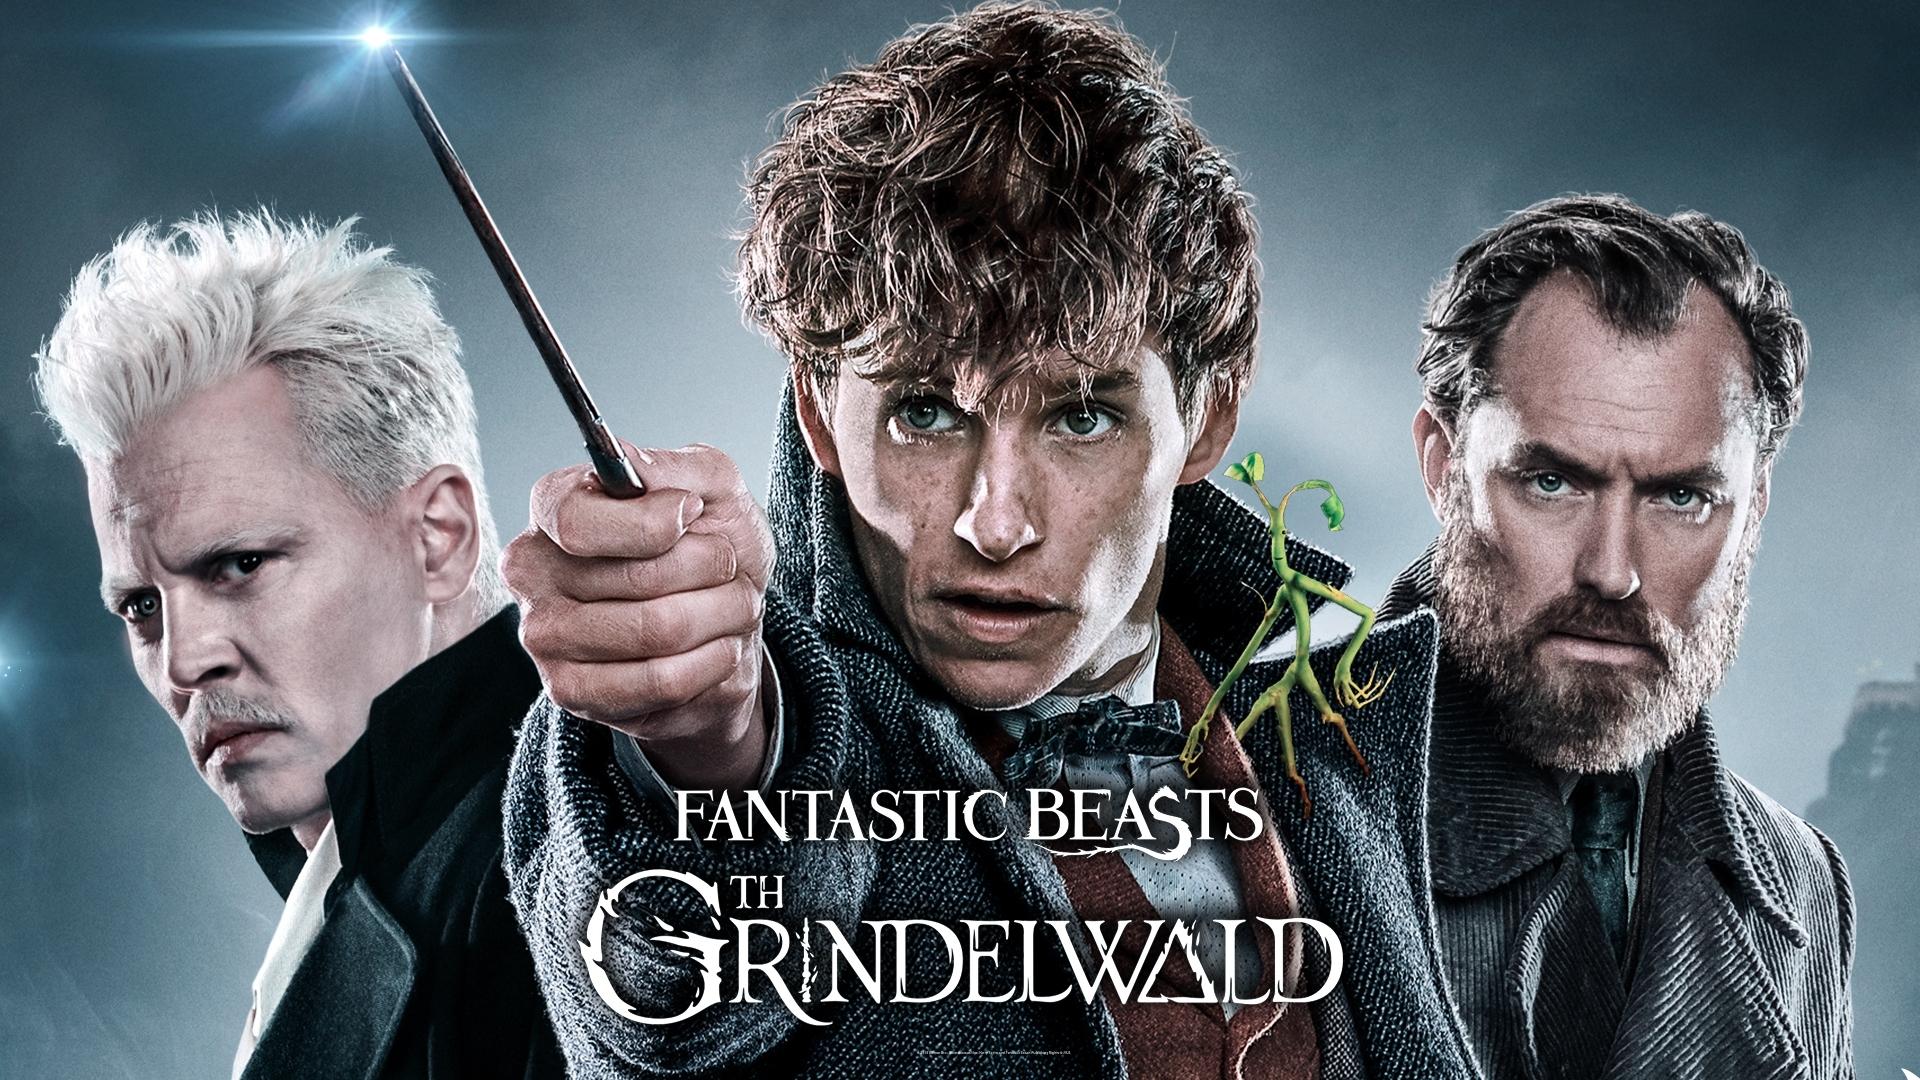 Fantastic Beasts: The Crimes of Grindelwald สัตว์มหัศจรรย์ อาชญากรรมของกรินเดลวัลด์